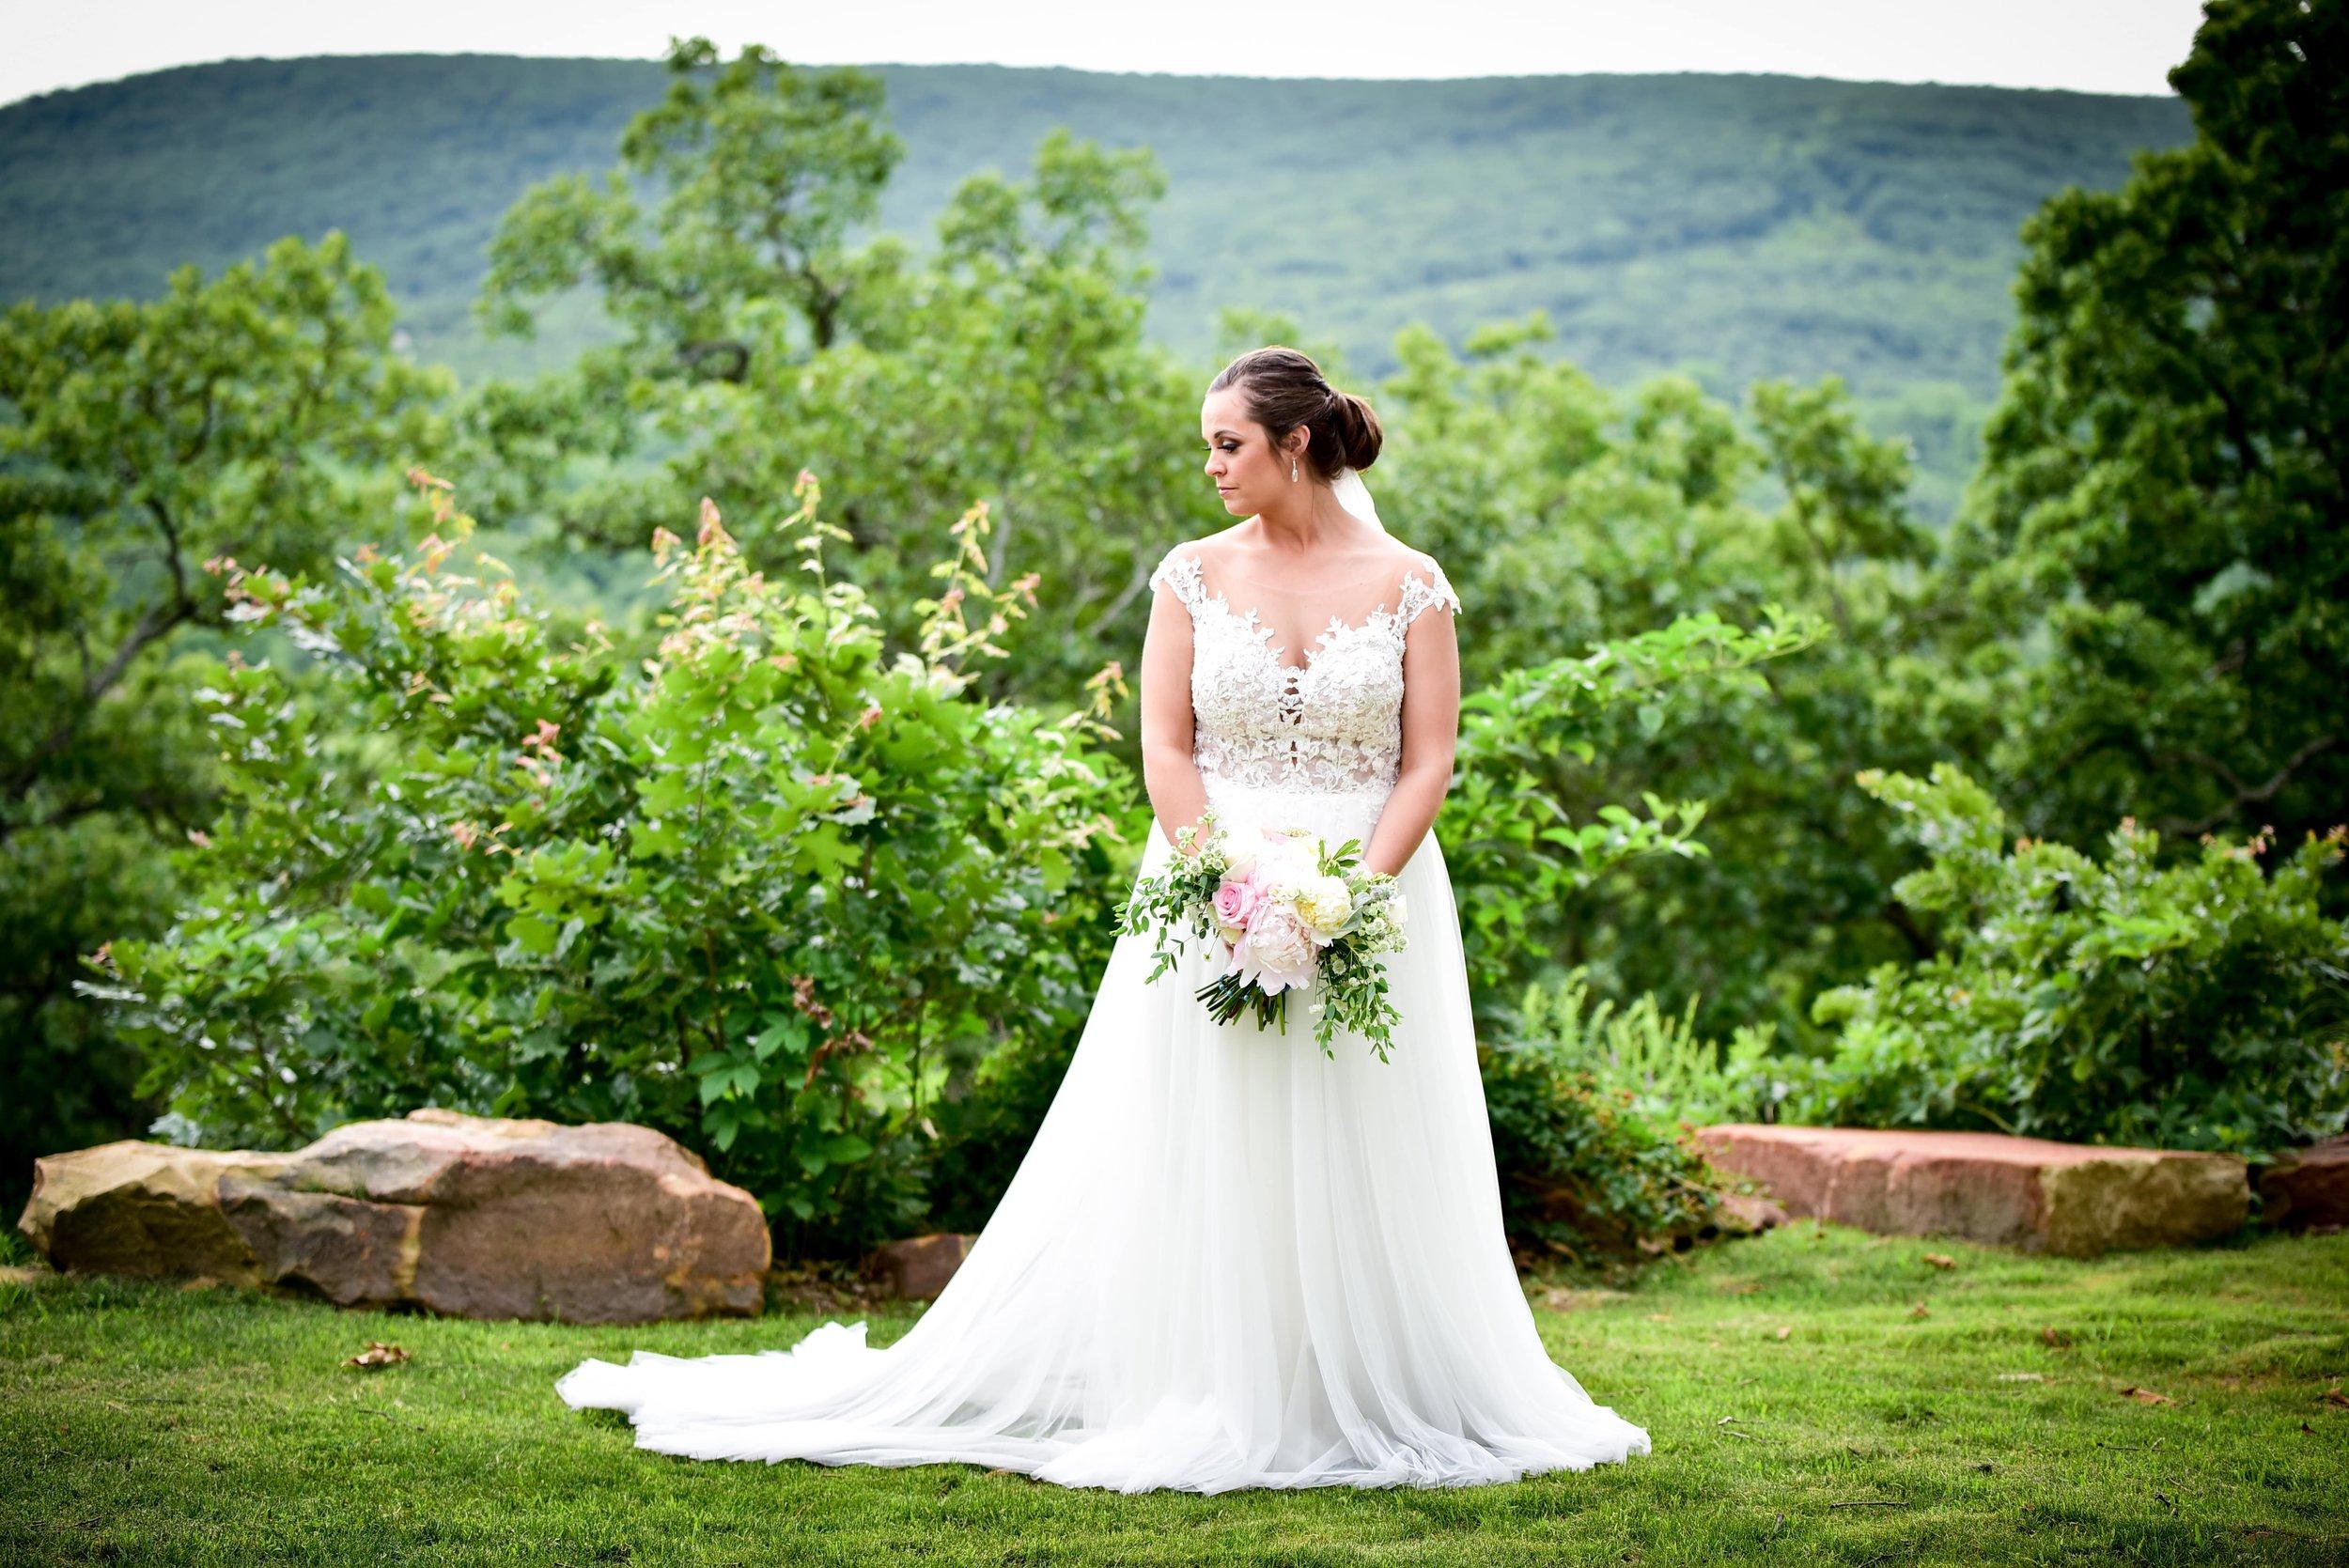 Modern Bright Light White Tulsa Wedding Venue 22-min.jpg